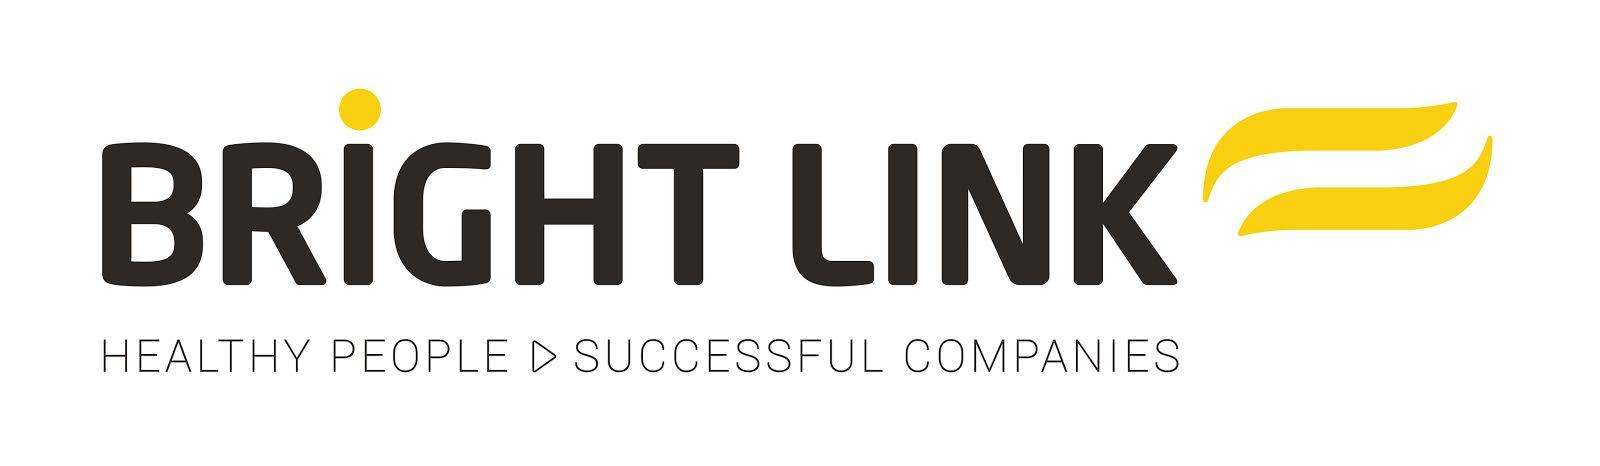 Two cents & bright link digital marketing strategie